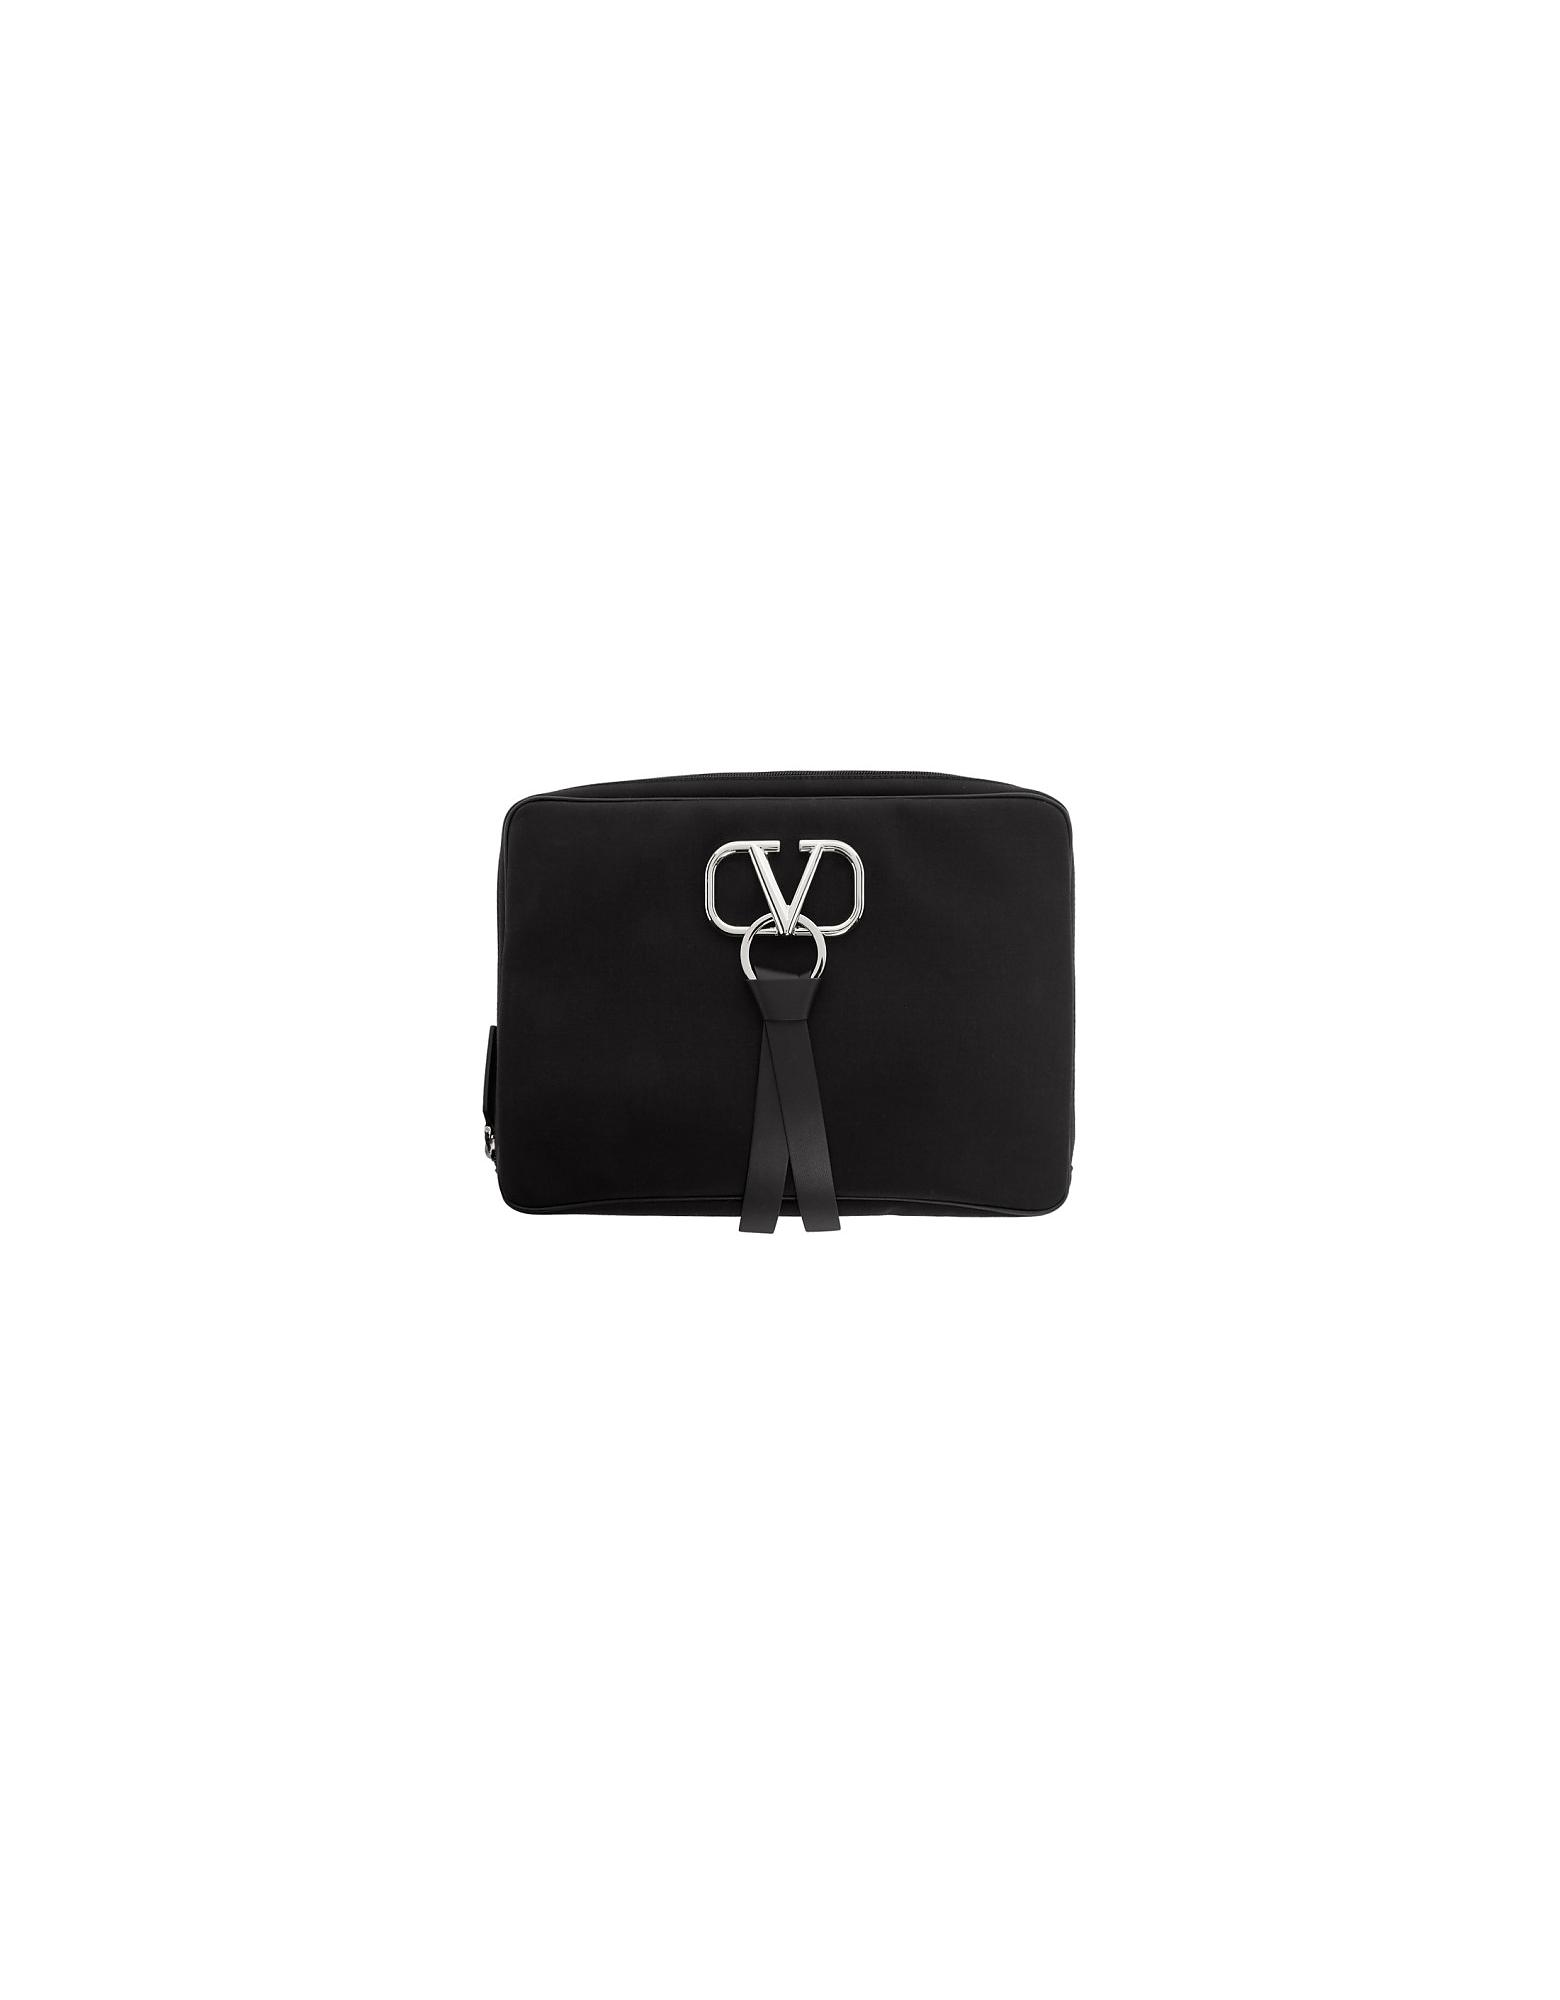 Valentino Designer Men's Bags, Black Valentino Garavani Large Nylon VRing Clutch